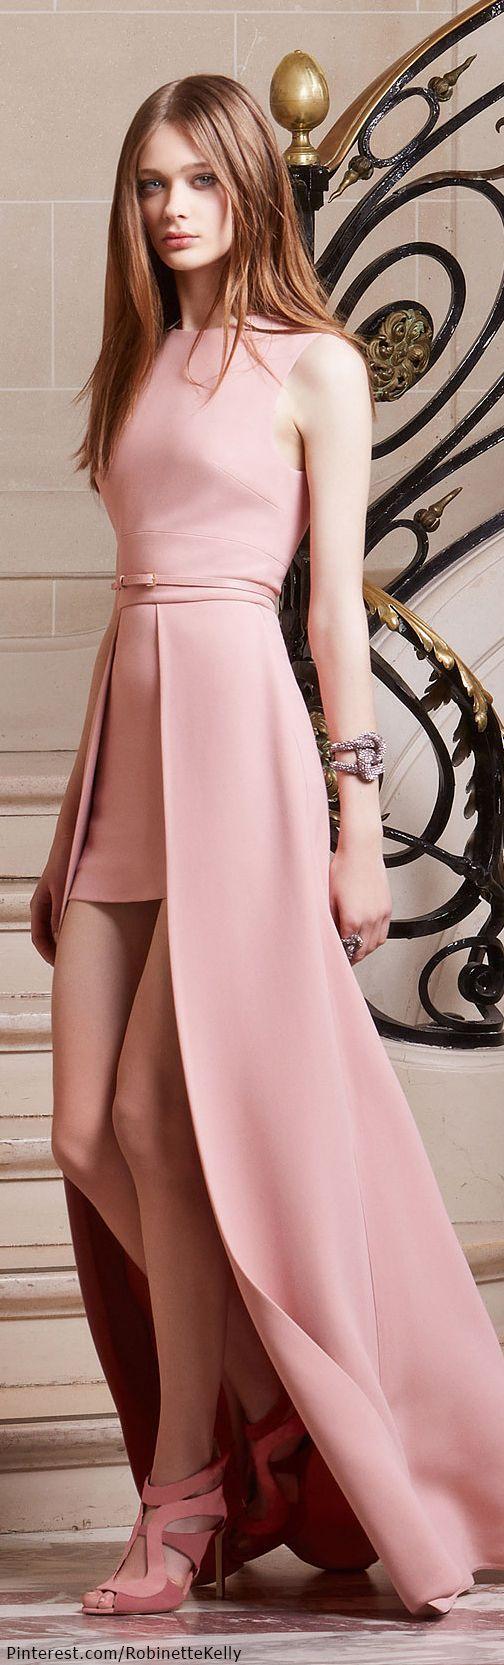 553 best Vestidos para boda civil | Civil wedding dresses images on ...